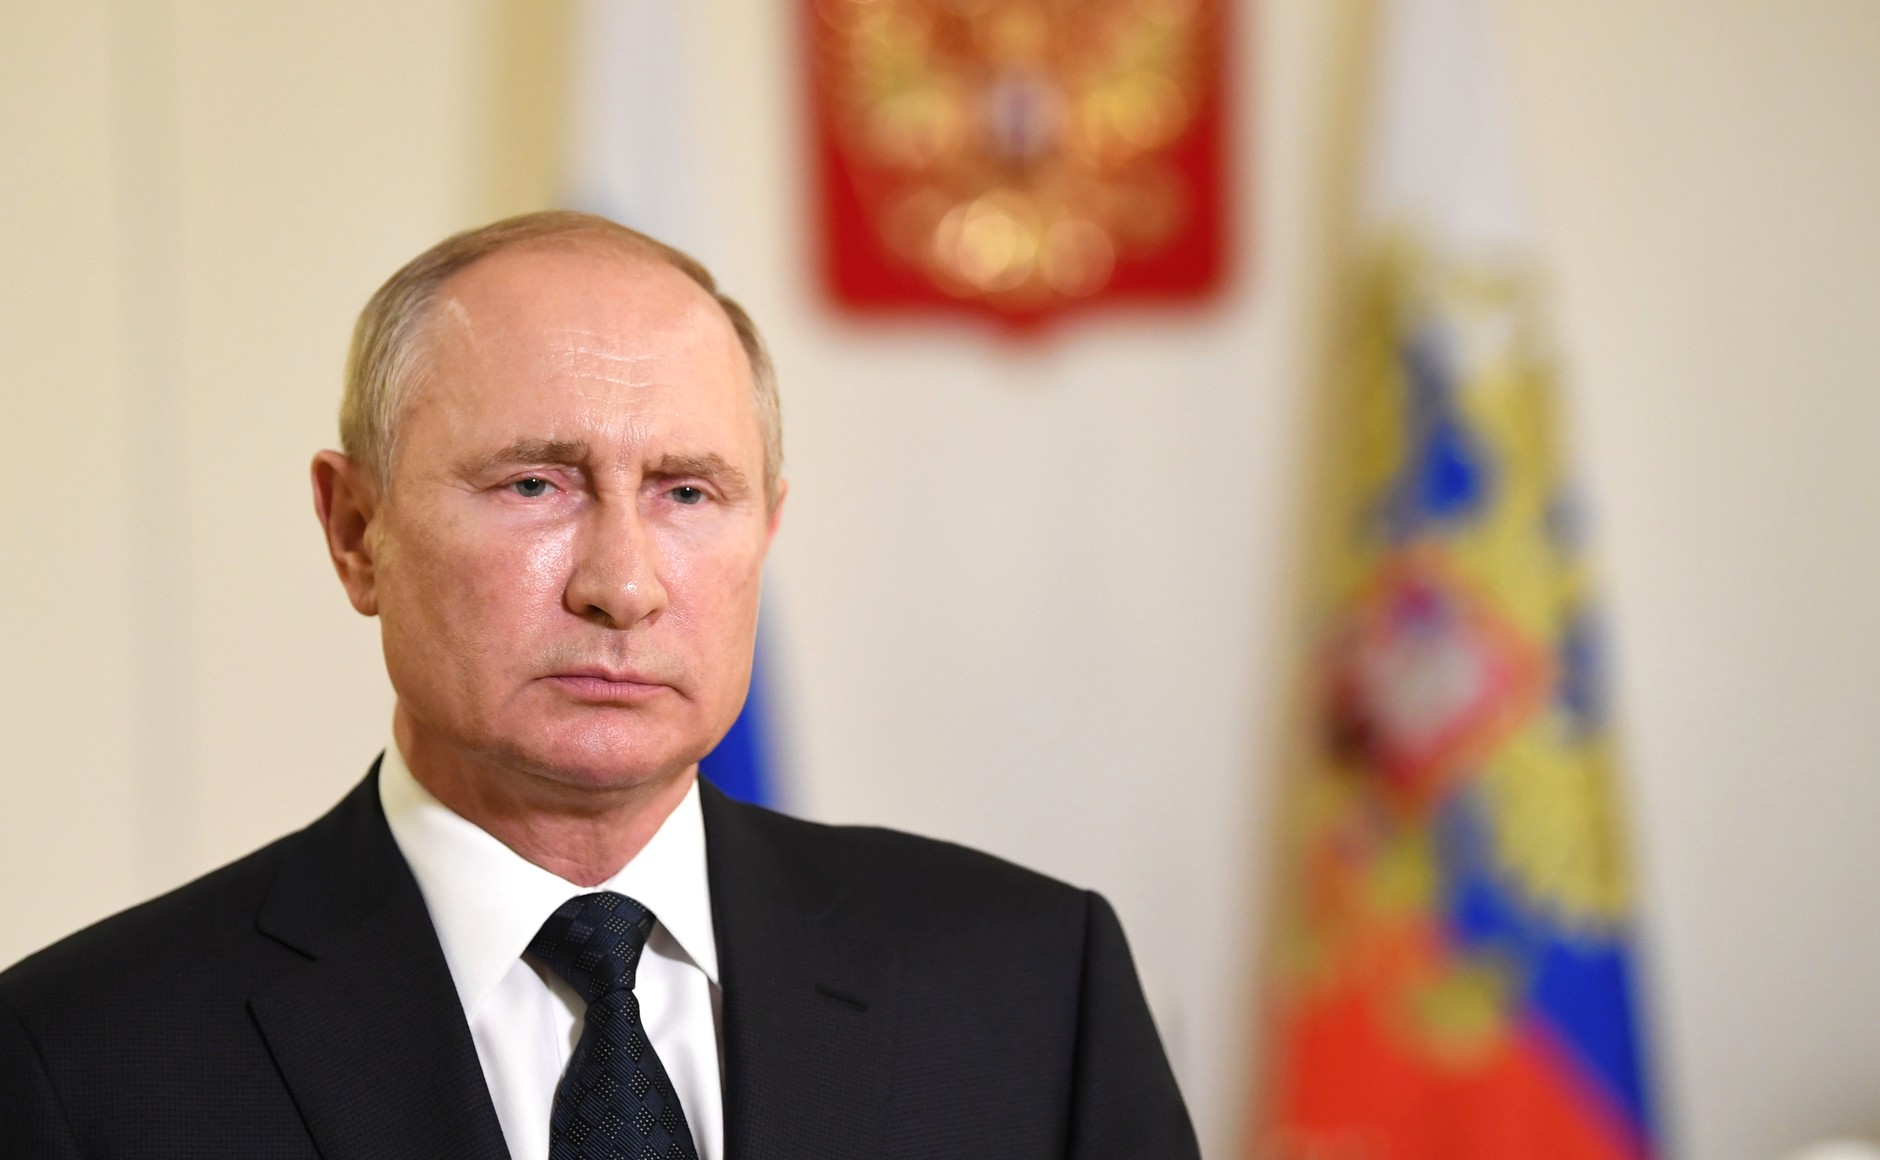 Vladimir Putin #новости The Sun, Владимир Путин, Дмитрий Песков